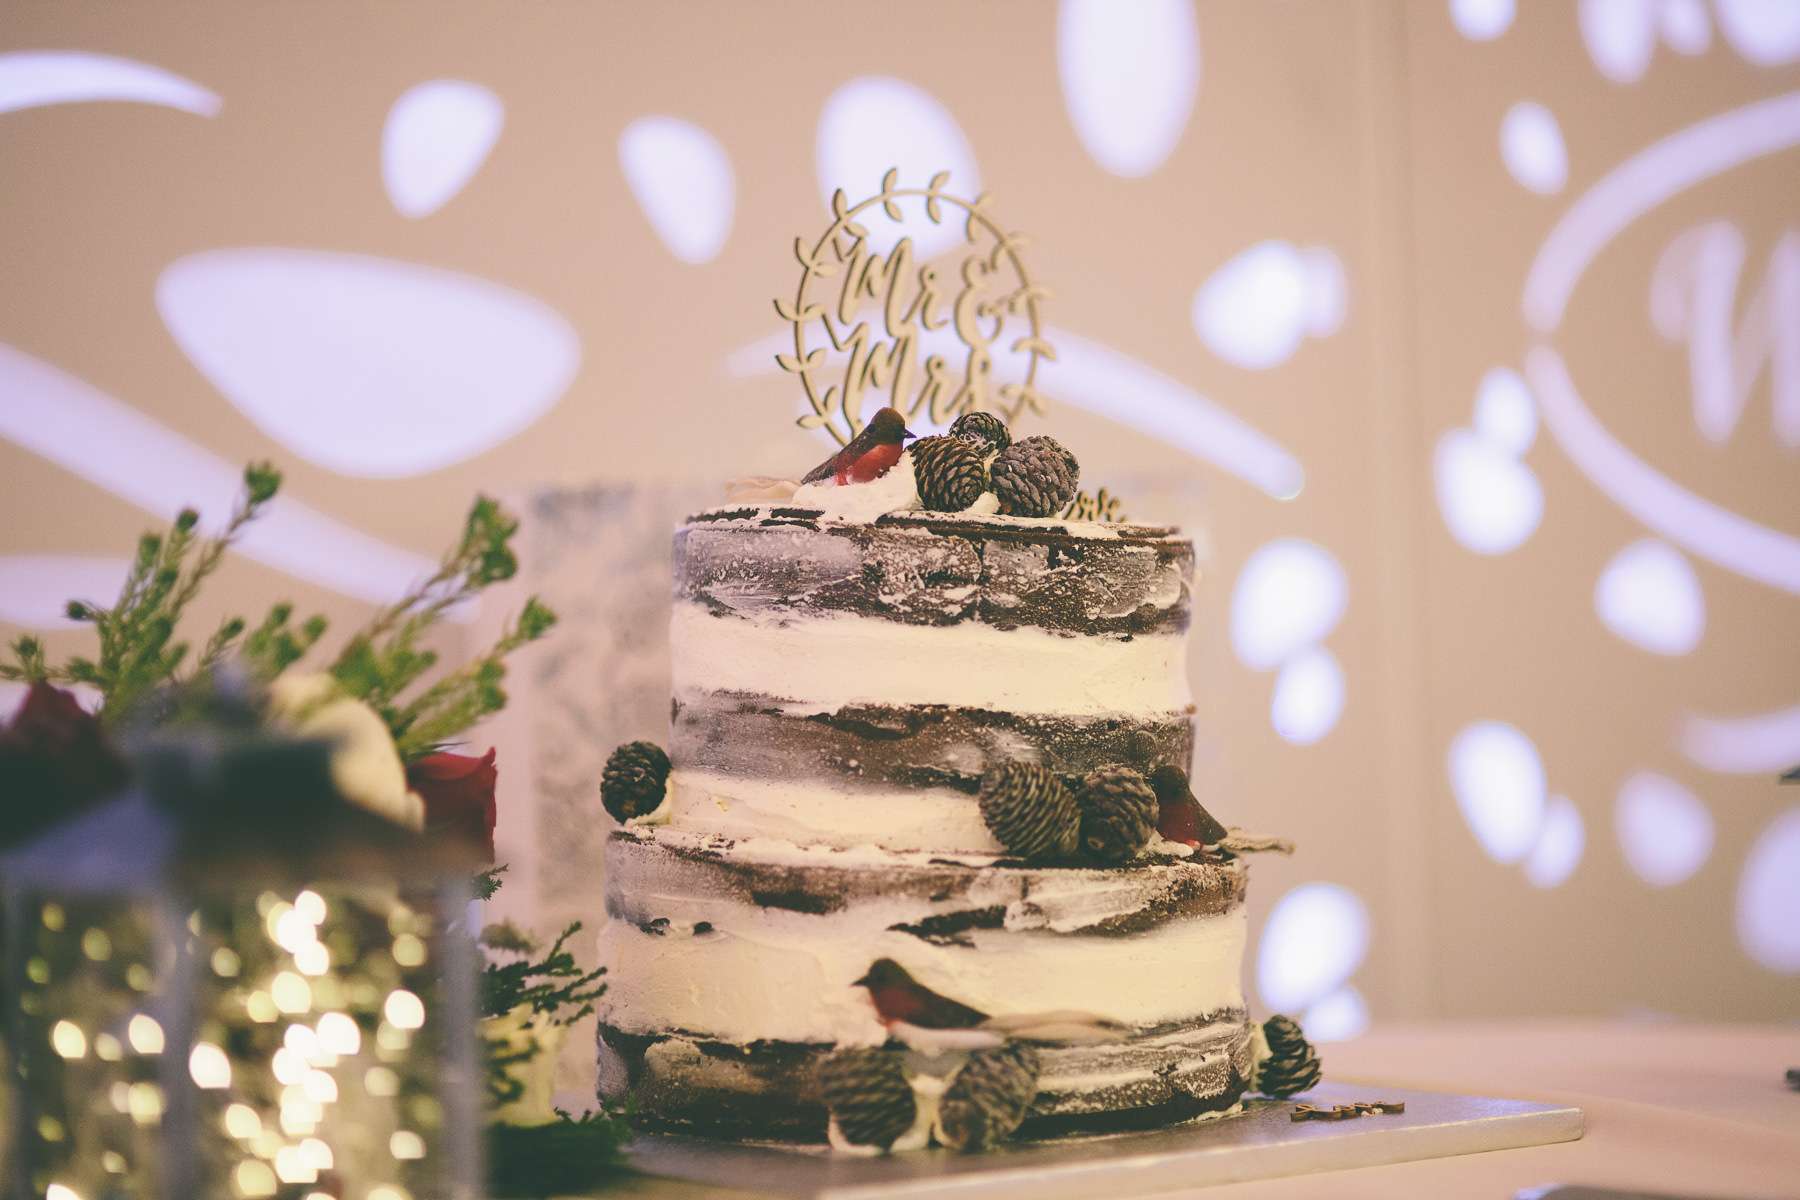 Titchfield-abbey-fareham-registry-wedding-photography-Jessica-and-Lance-web-207